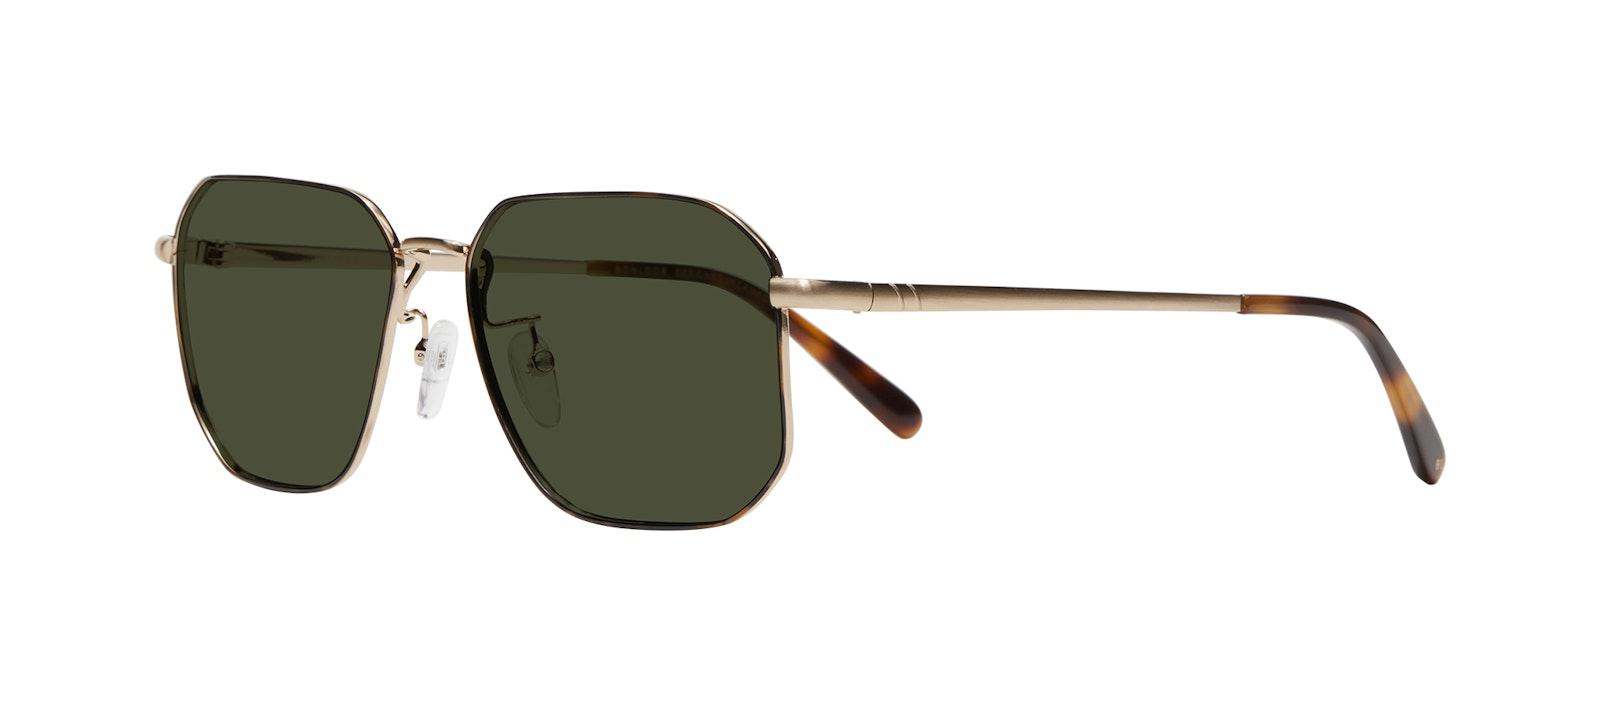 Affordable Fashion Glasses Square Sunglasses Men Timeless Tortoise Tilt